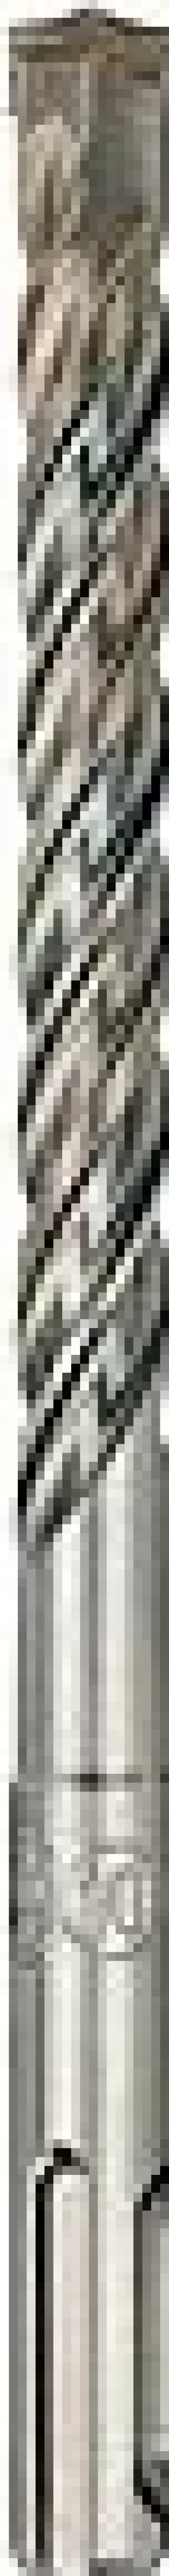 Burghiu EXTREME SDS Plus 8x260x200 Dewalt Accesorii masini de gaurit